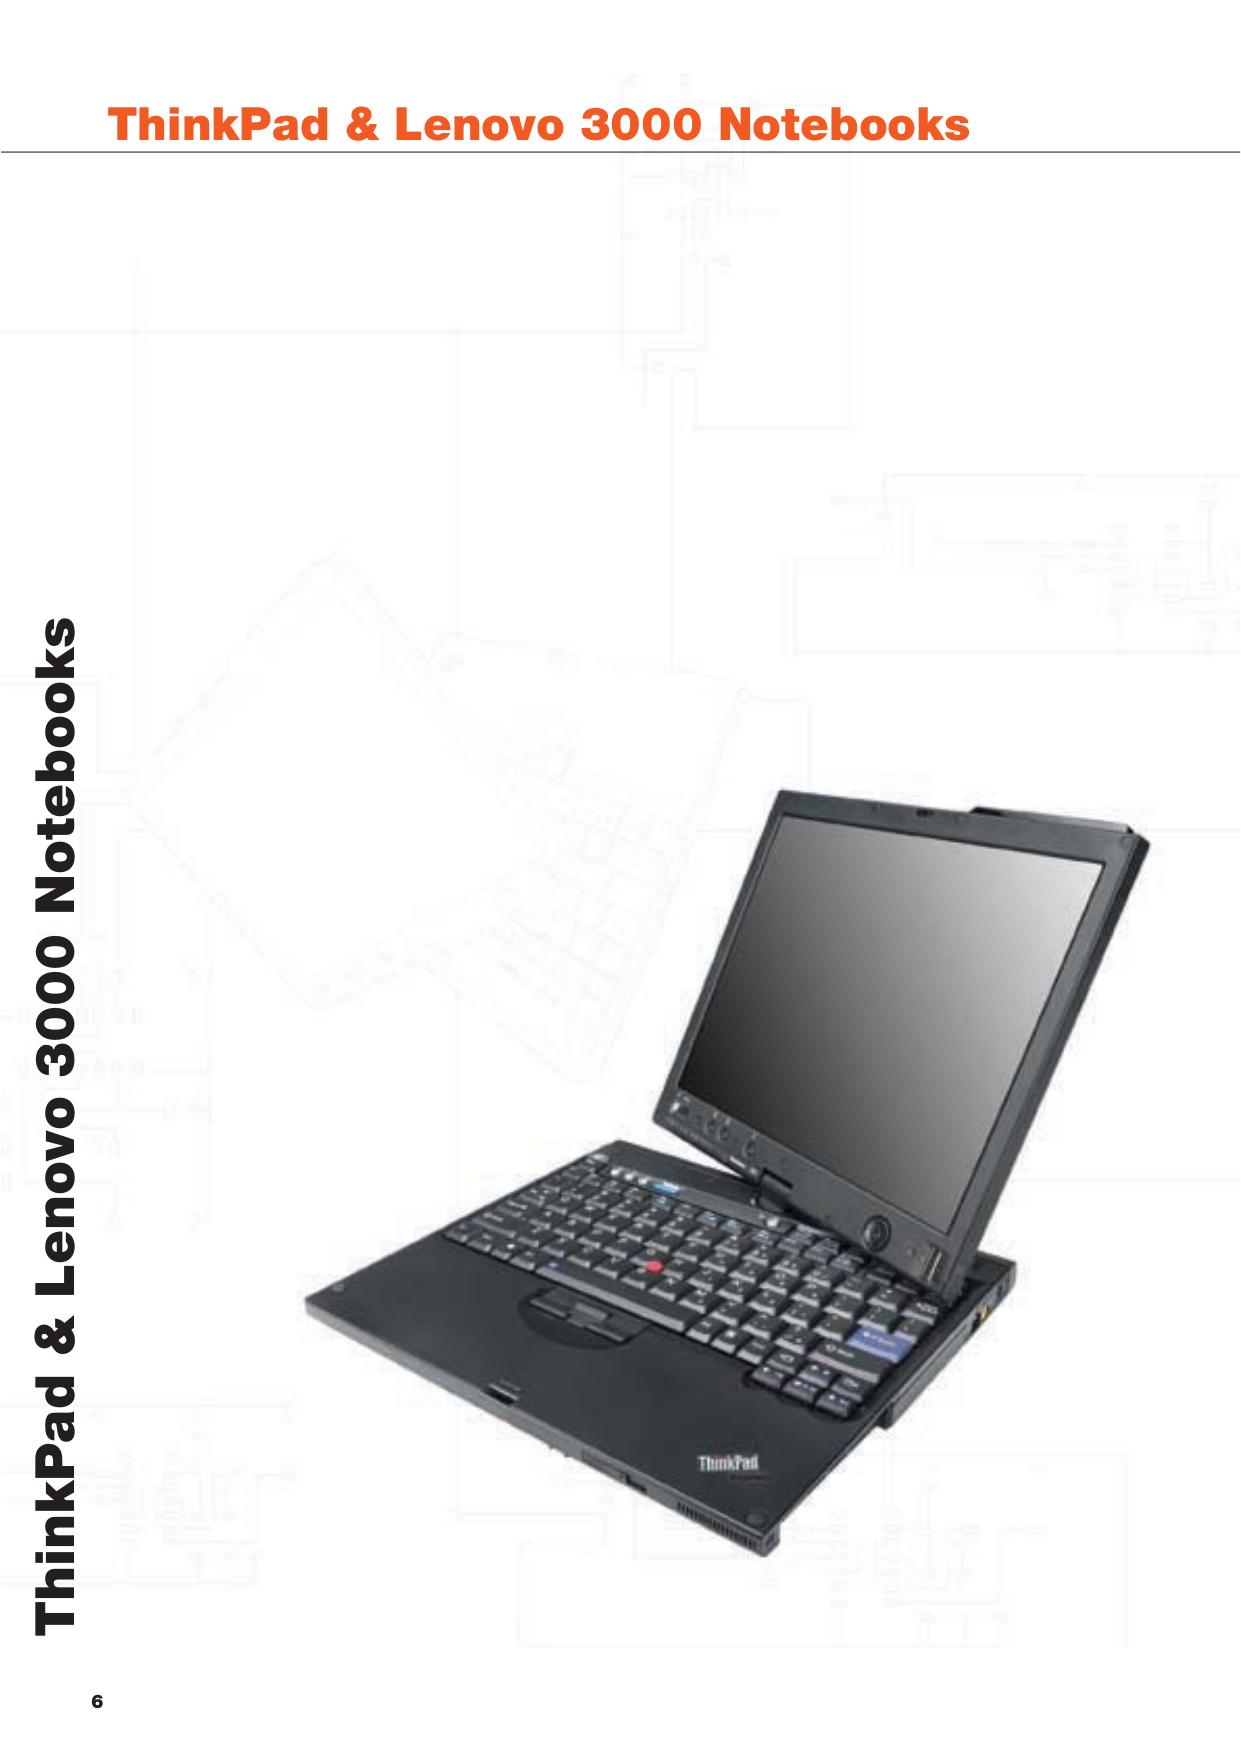 PDF manual for Lenovo Laptop 3000 N200 0769